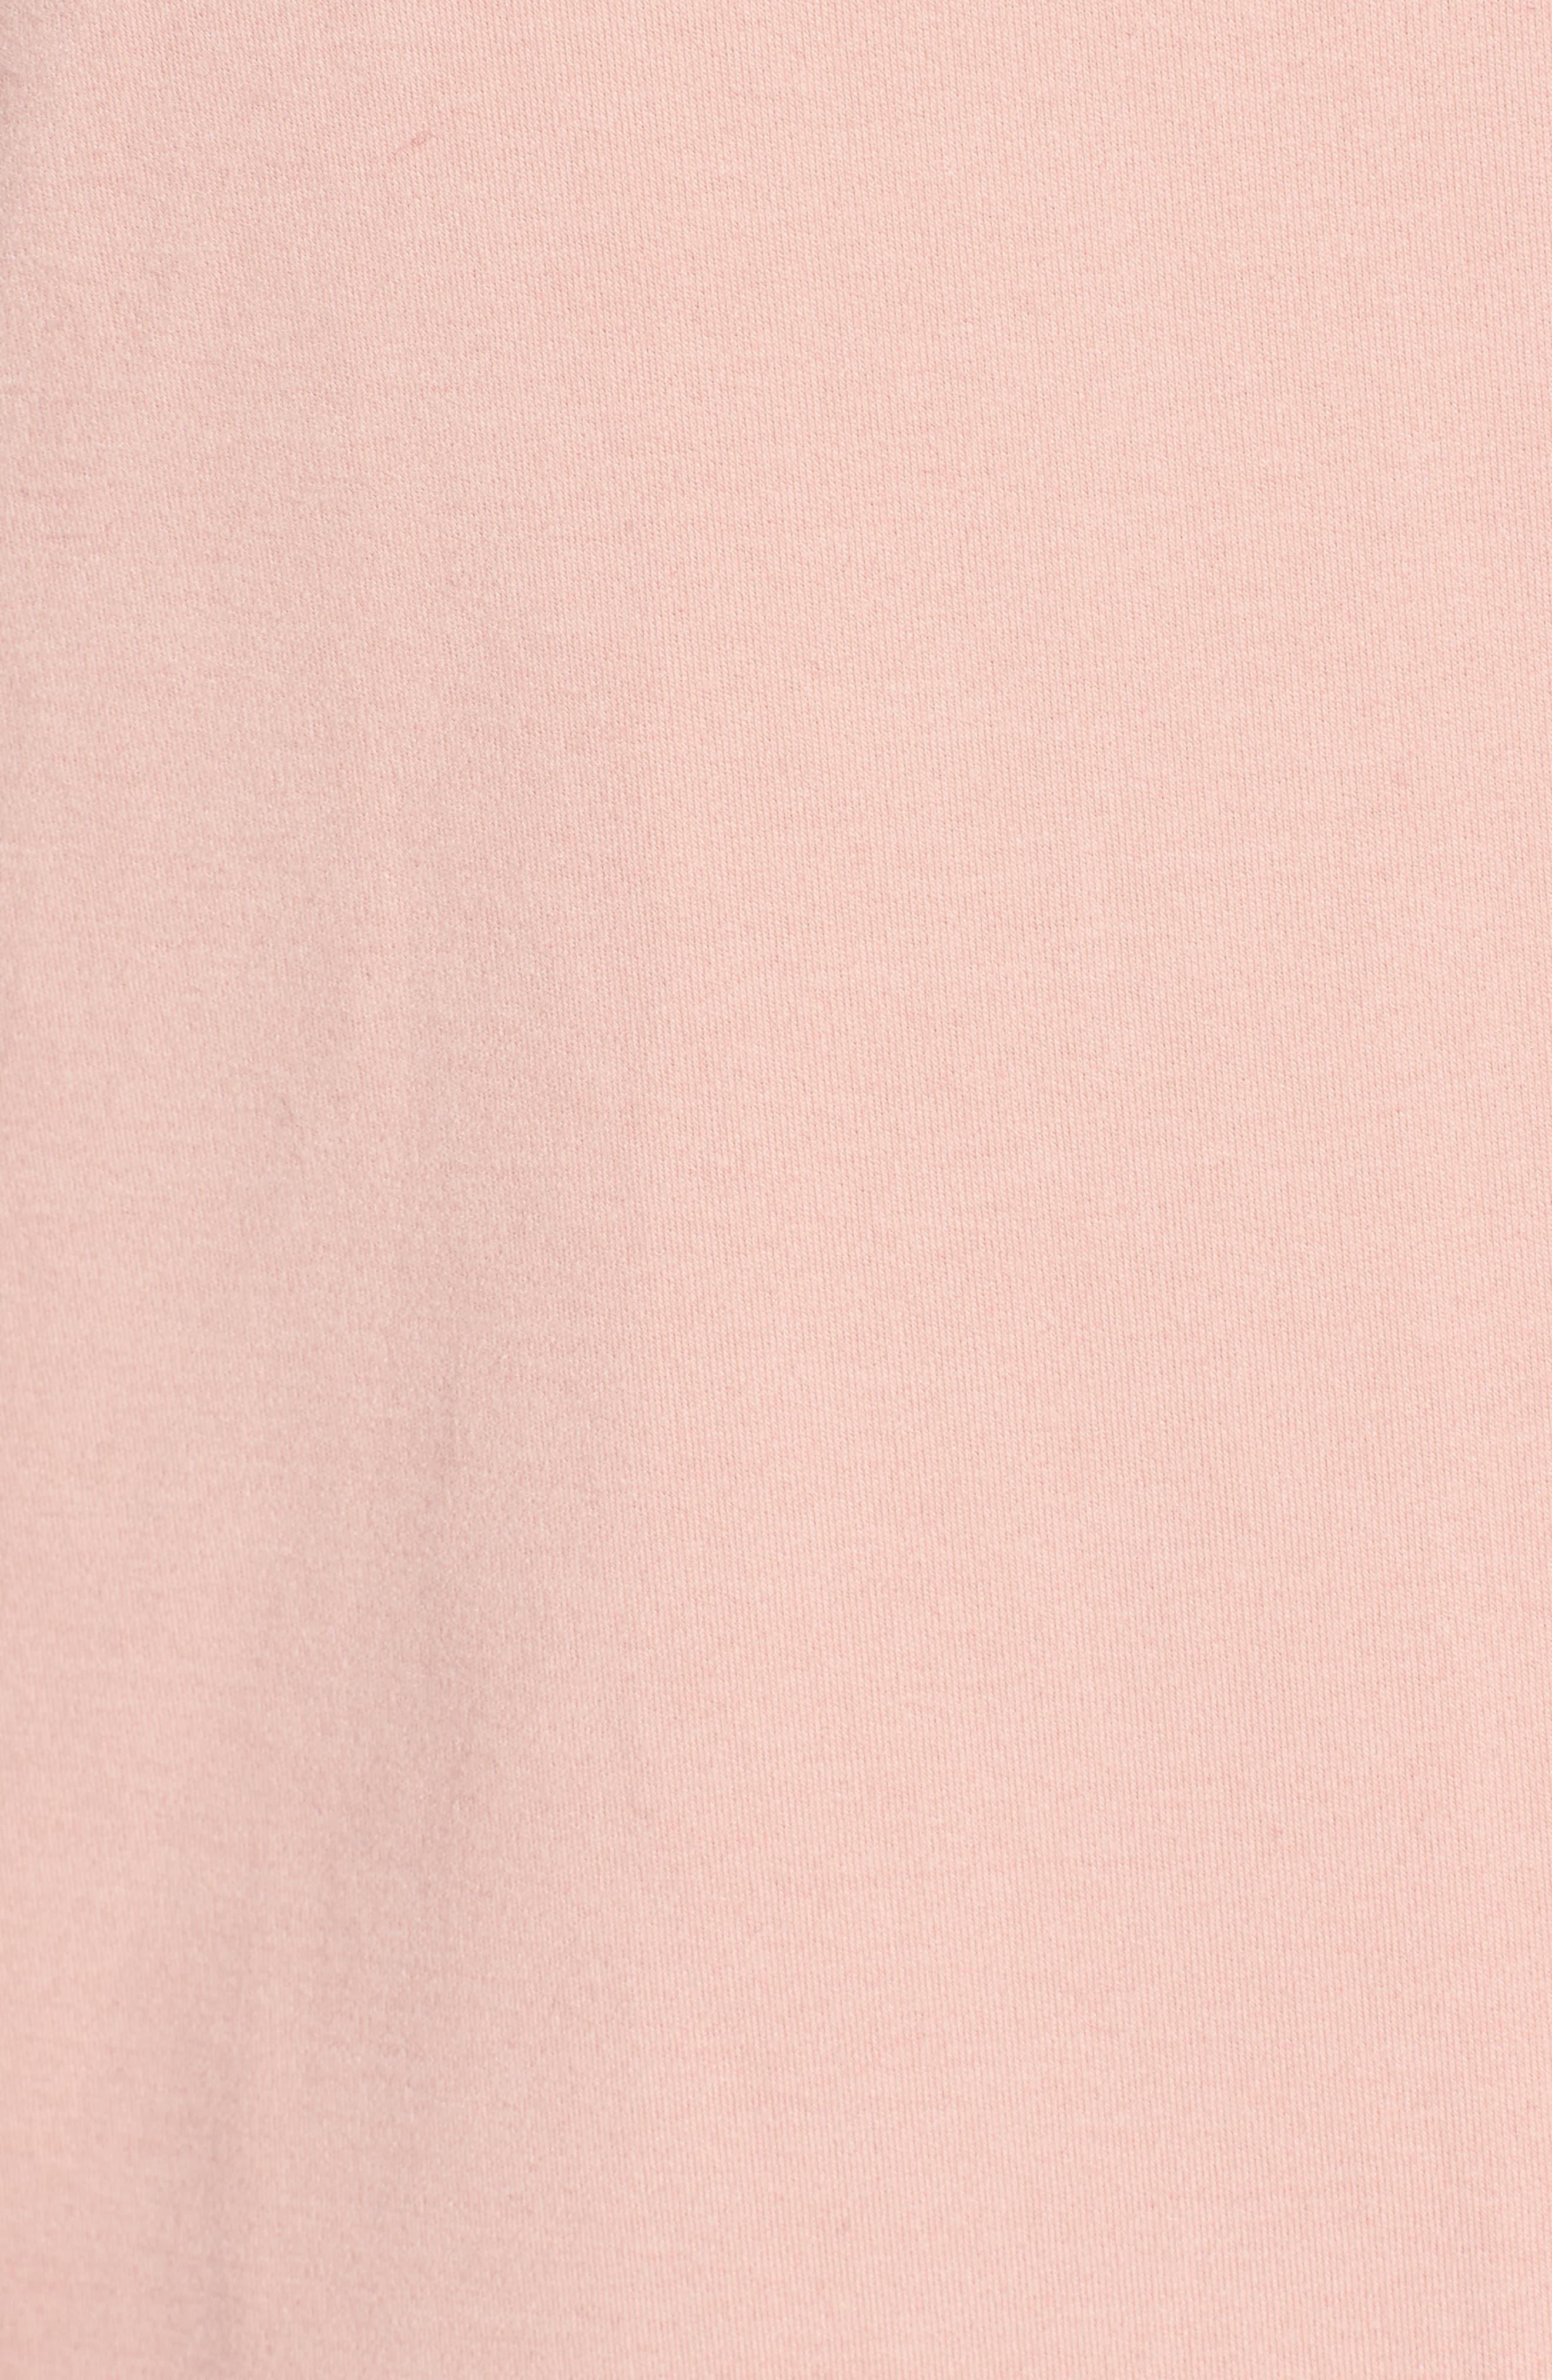 Cinch Cuff Pullover,                             Alternate thumbnail 5, color,                             Blush